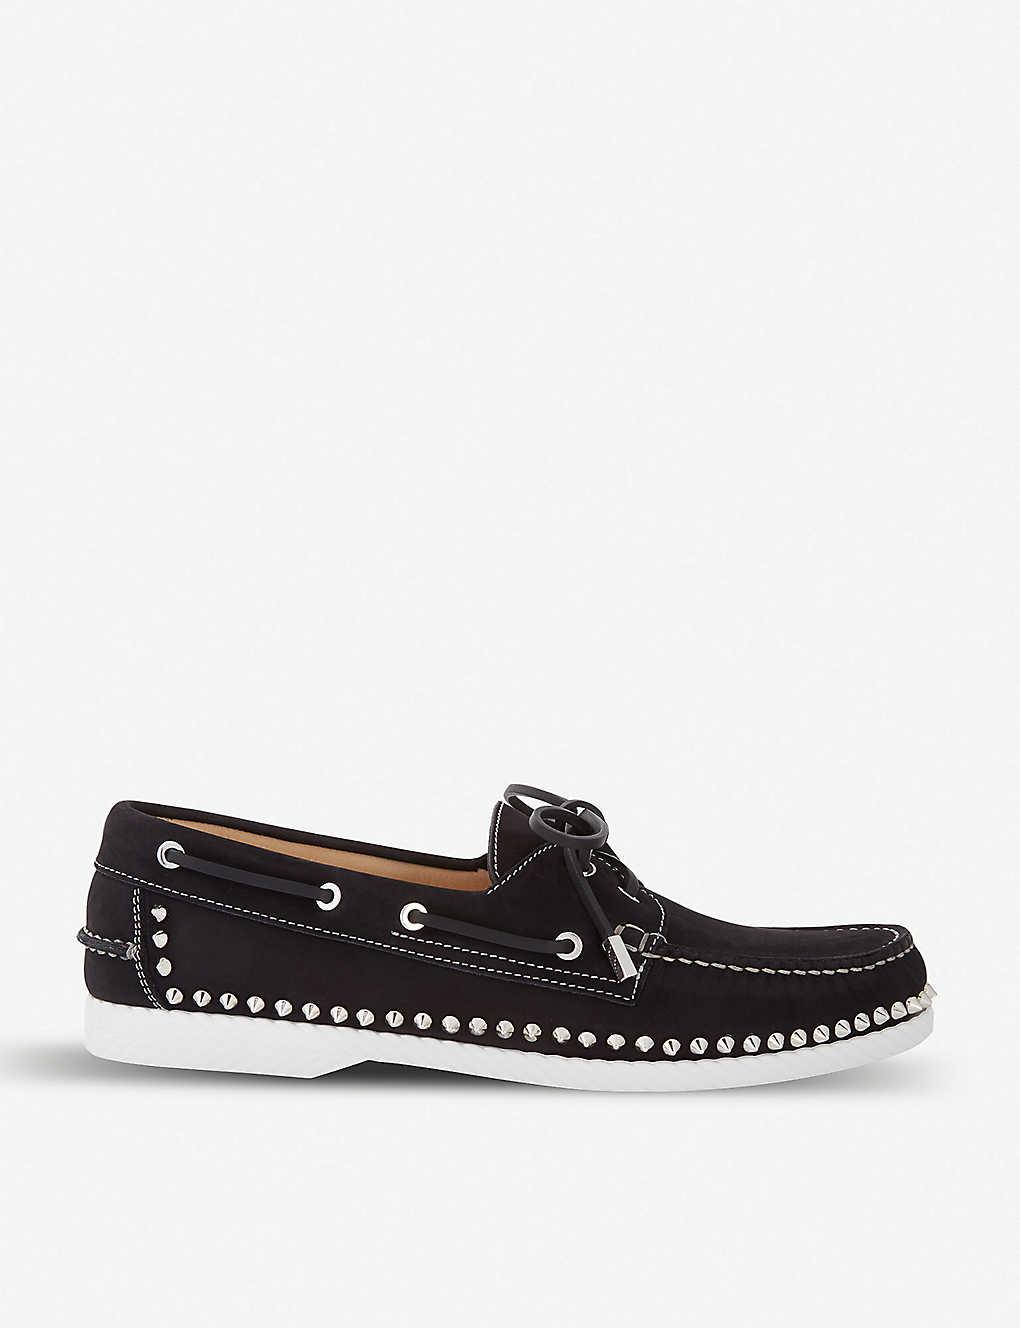 5e9c711760d09 CHRISTIAN LOUBOUTIN - Steckel flat calf nabuck black | Selfridges.com